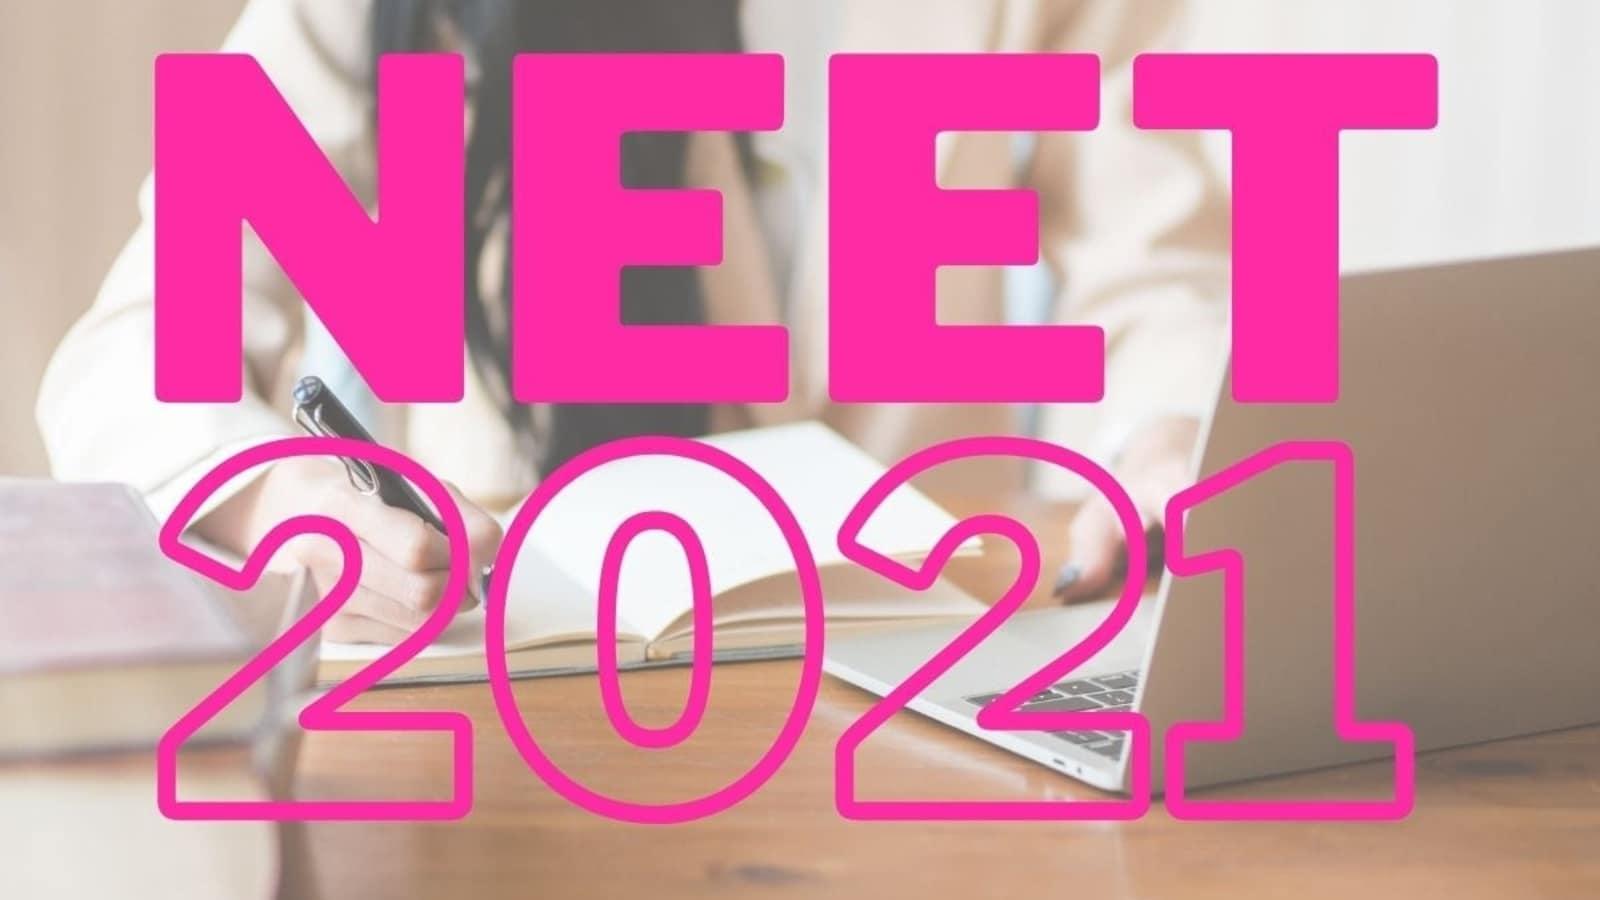 NEET UG 2021: Application correction window closes today